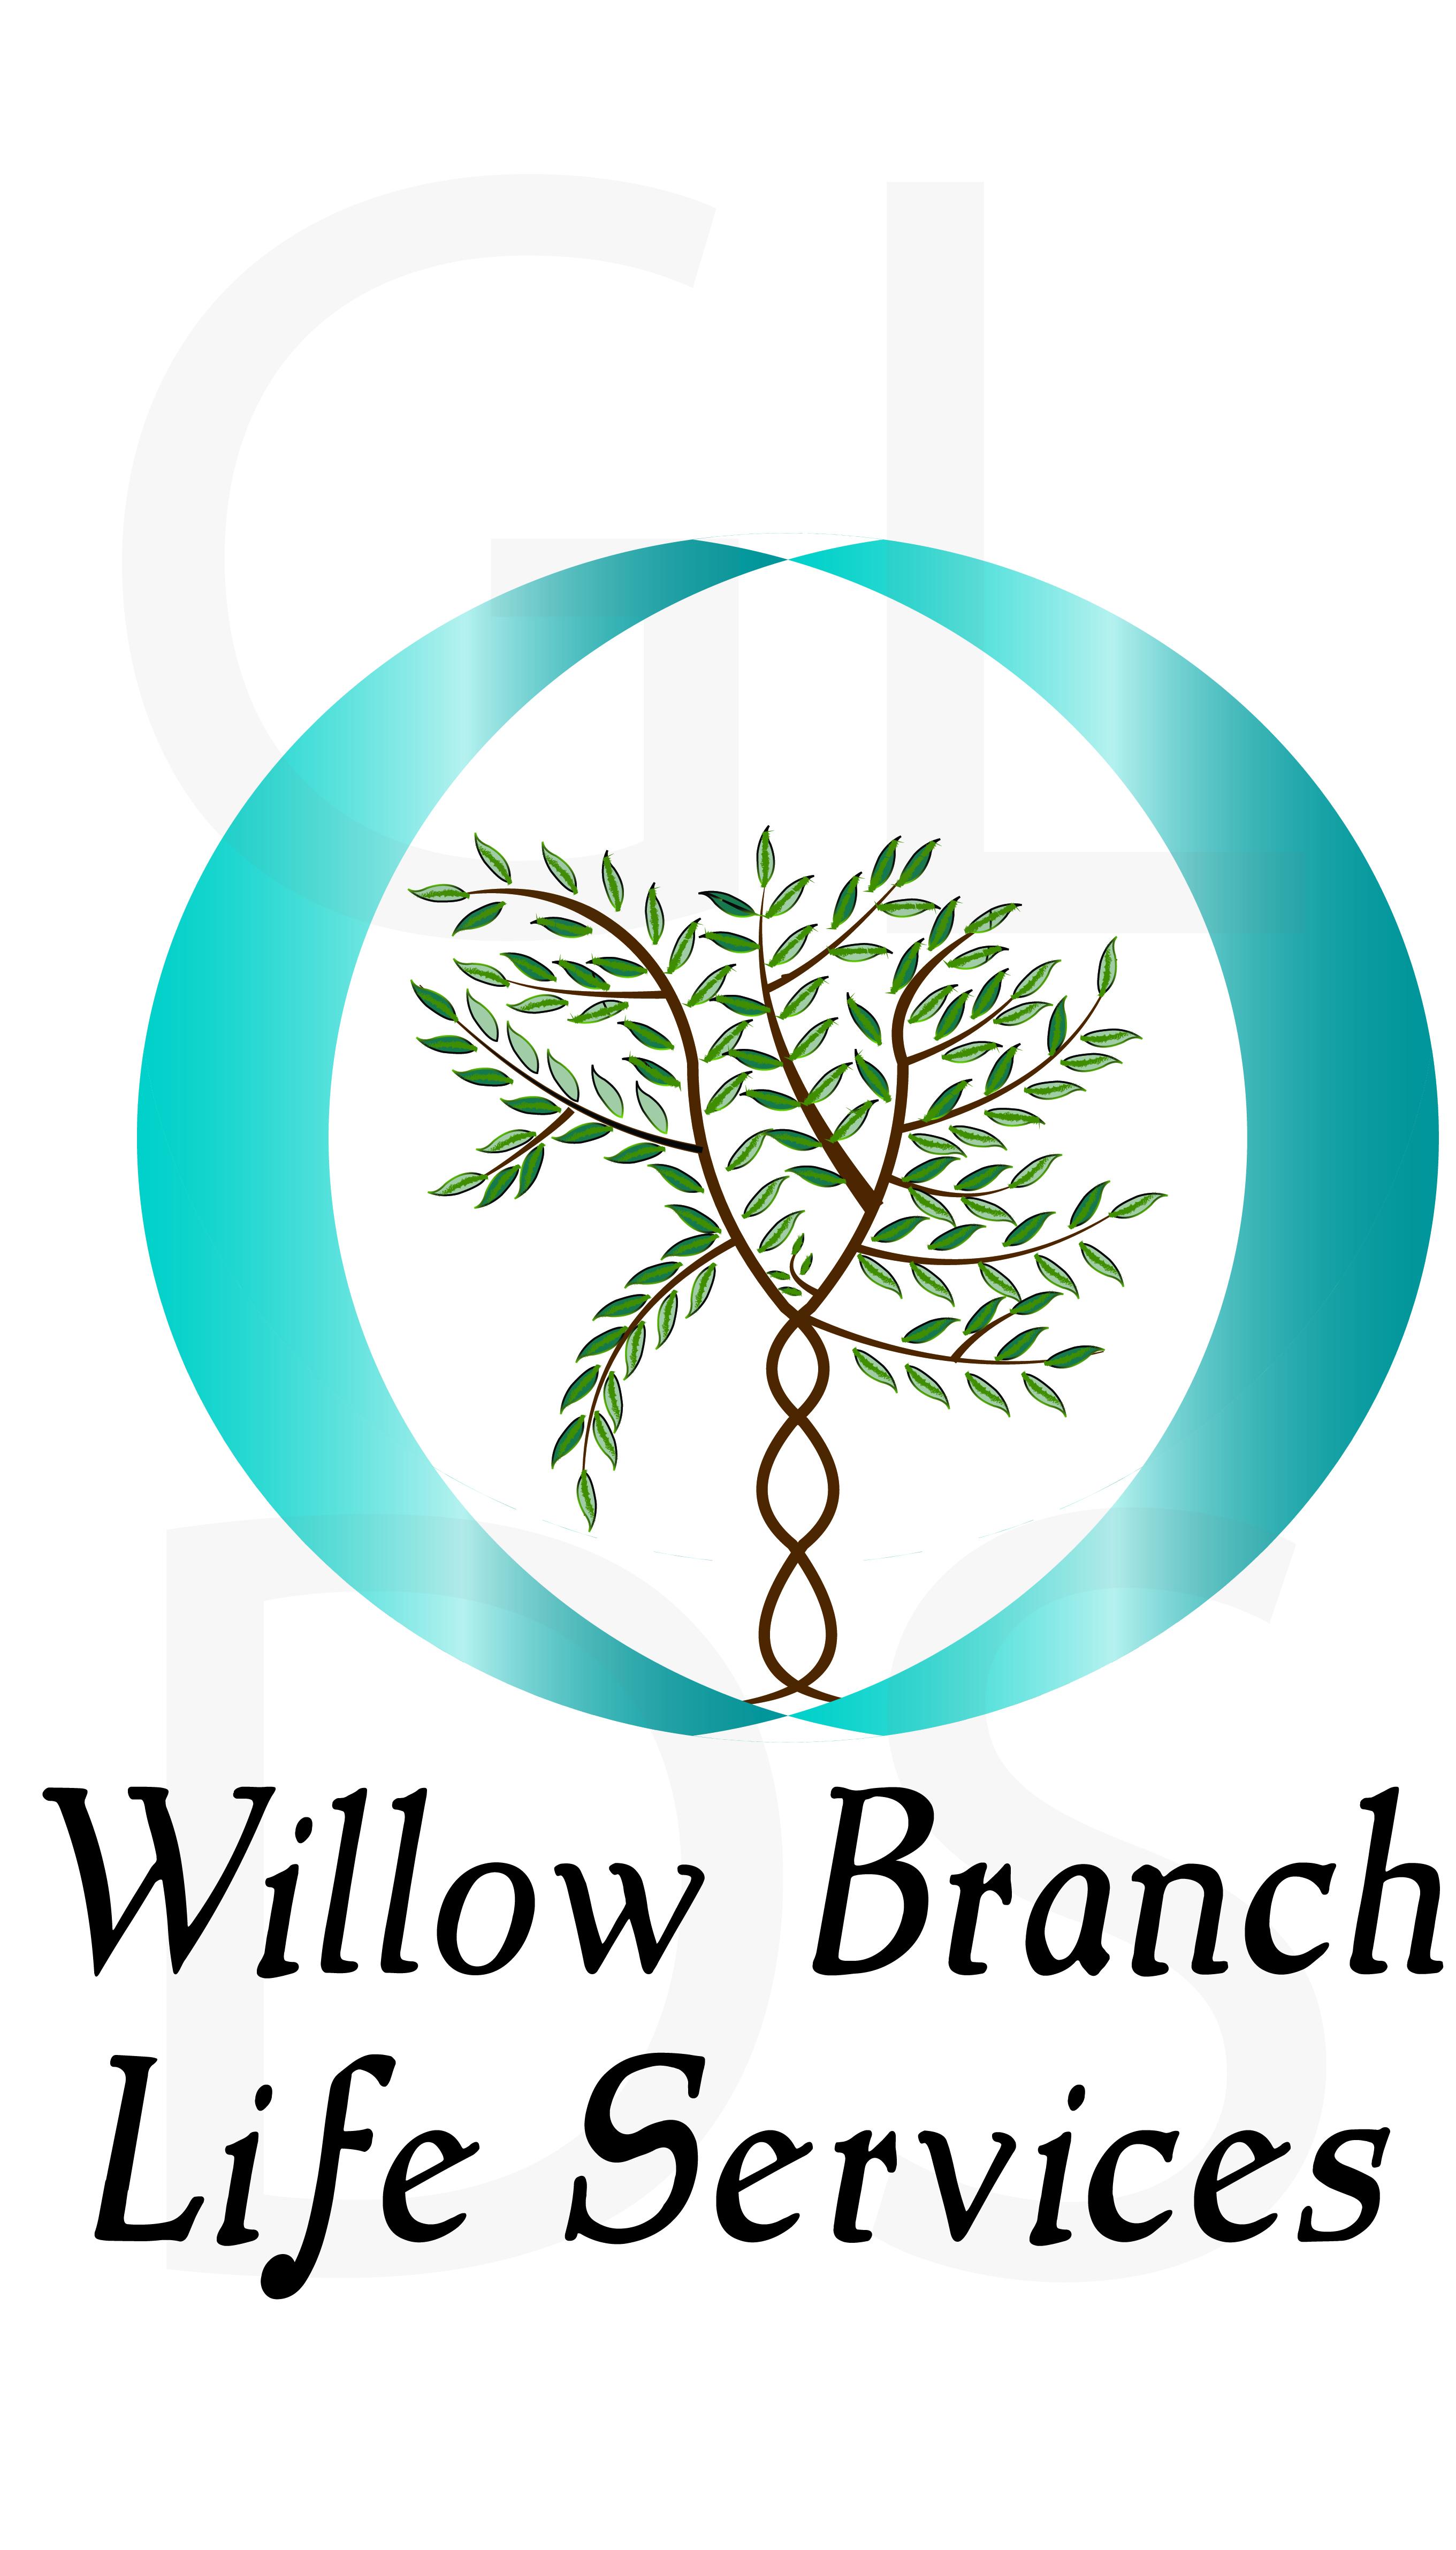 Logo Design by Goran Ledjenovic - Entry No. 310 in the Logo Design Contest Artistic Logo Design for Willow Branch Life Service.